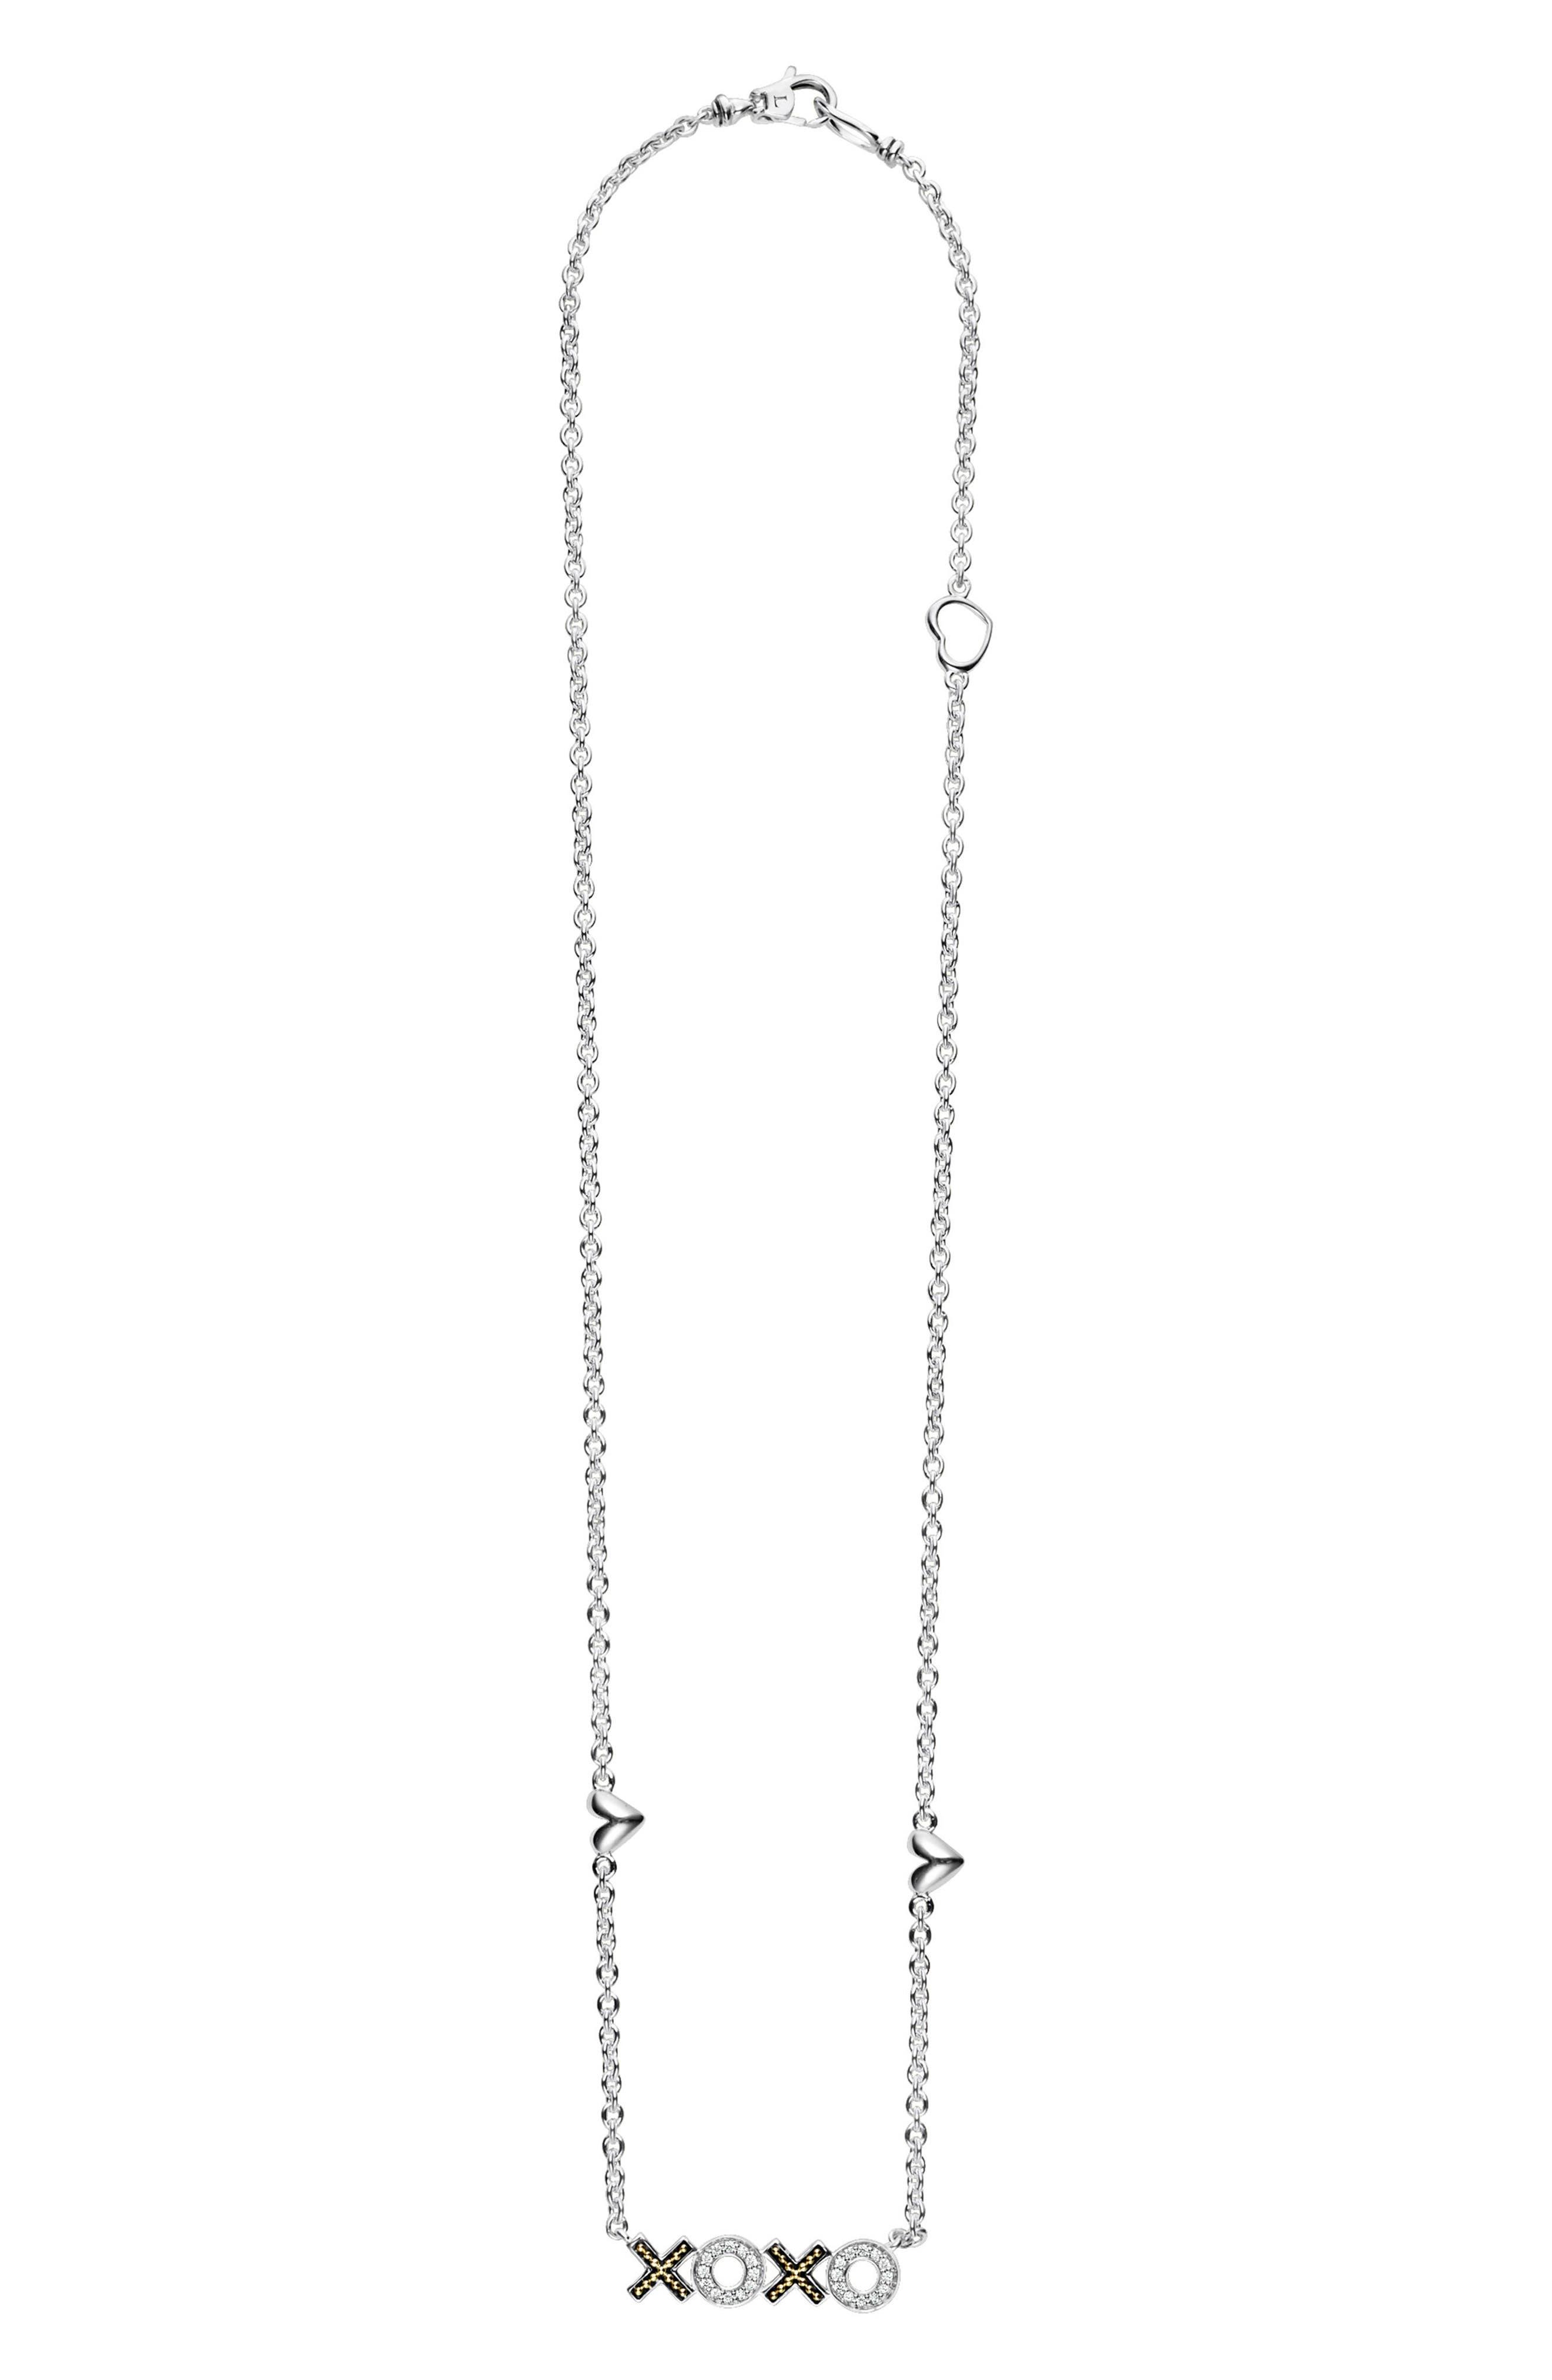 Beloved Diamond XOXO Chain Necklace,                         Main,                         color, Silver/ Diamond